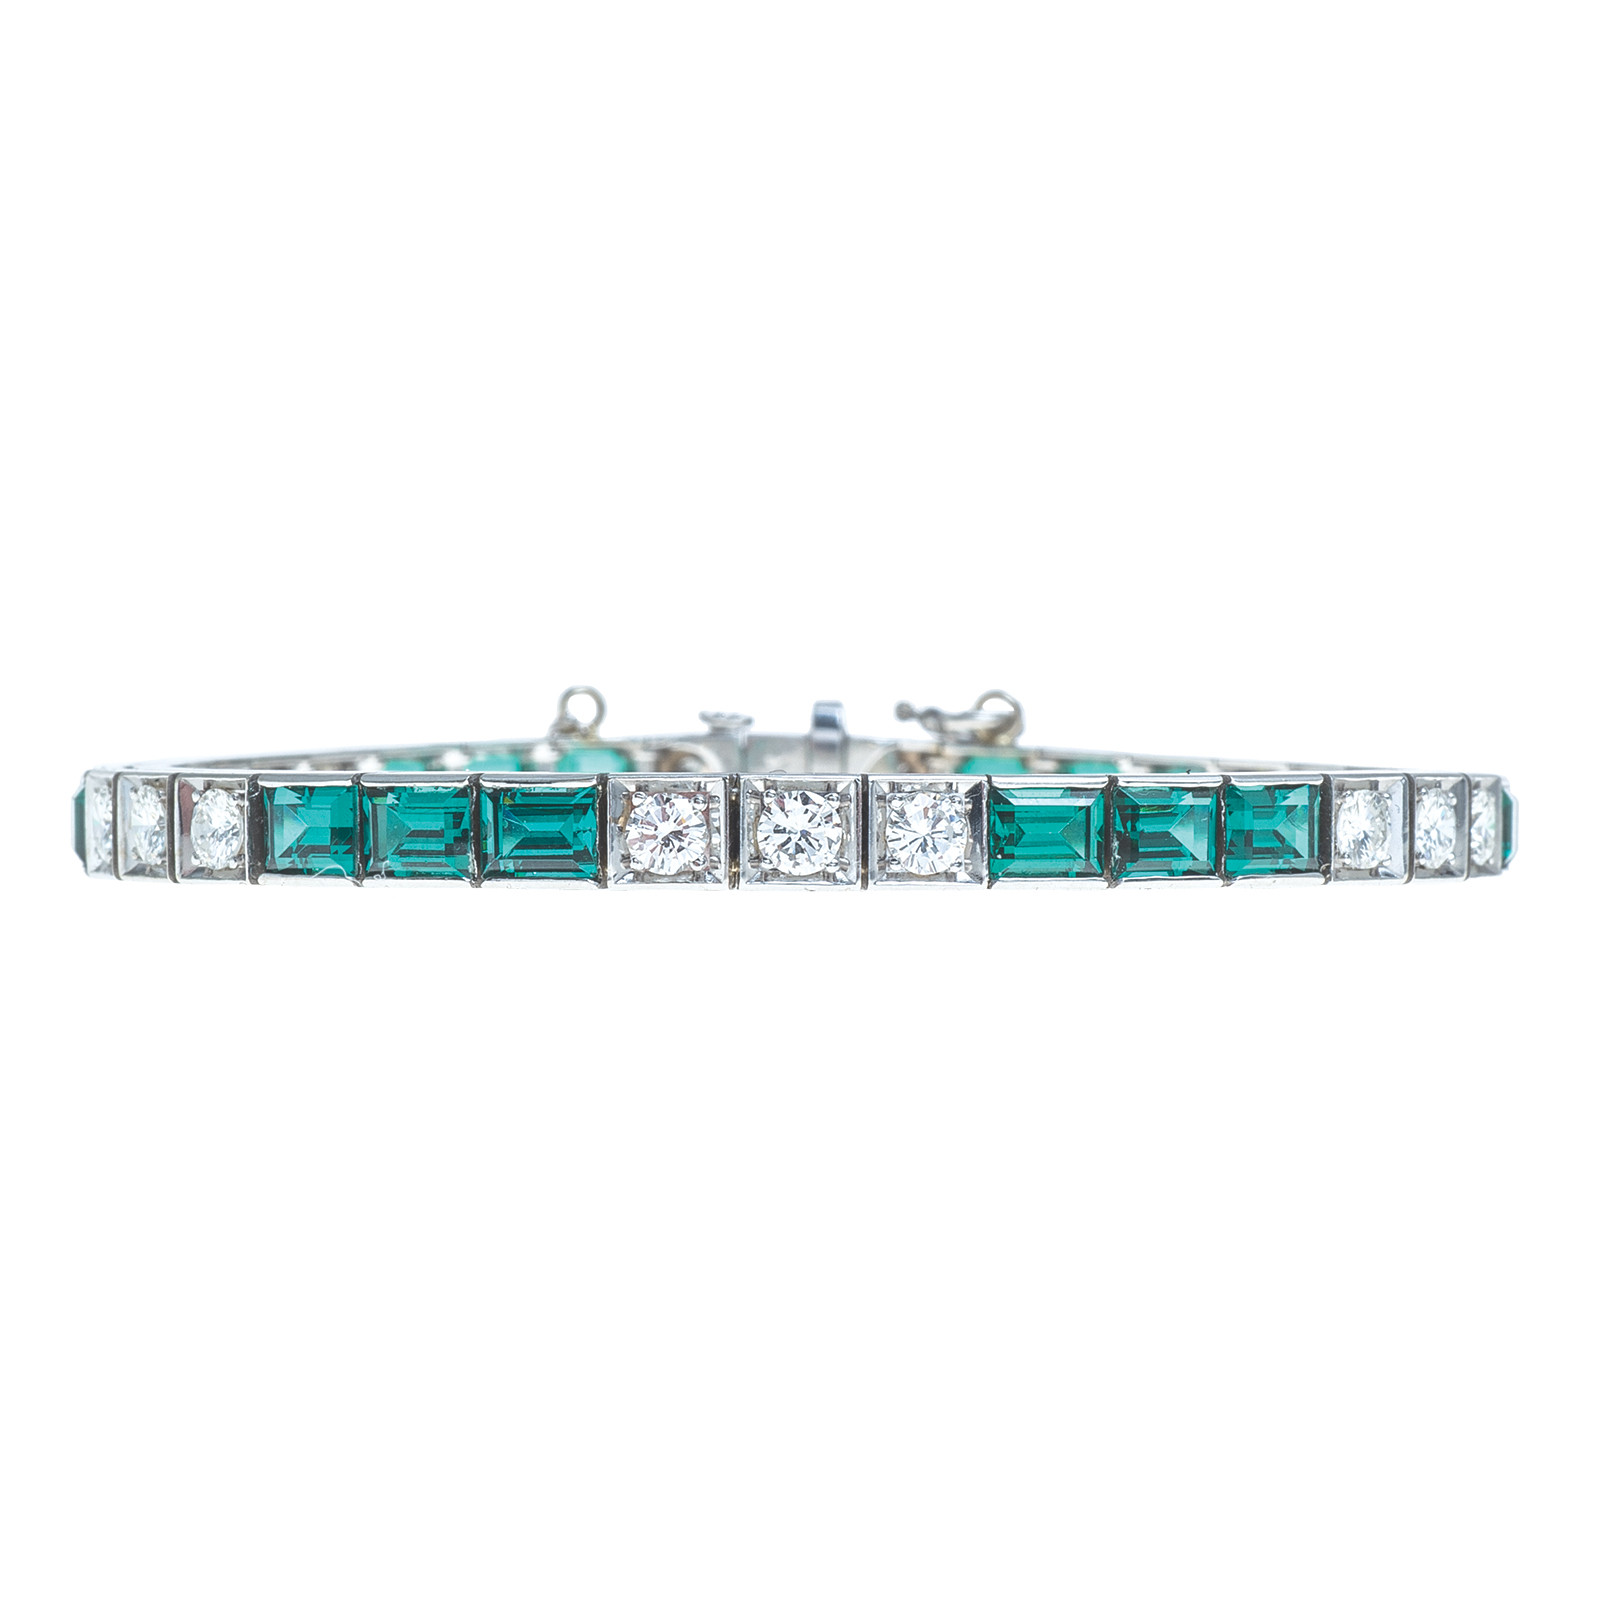 Vintage 7.35 CTW Diamond & Green Spinel Tennis Bracelet